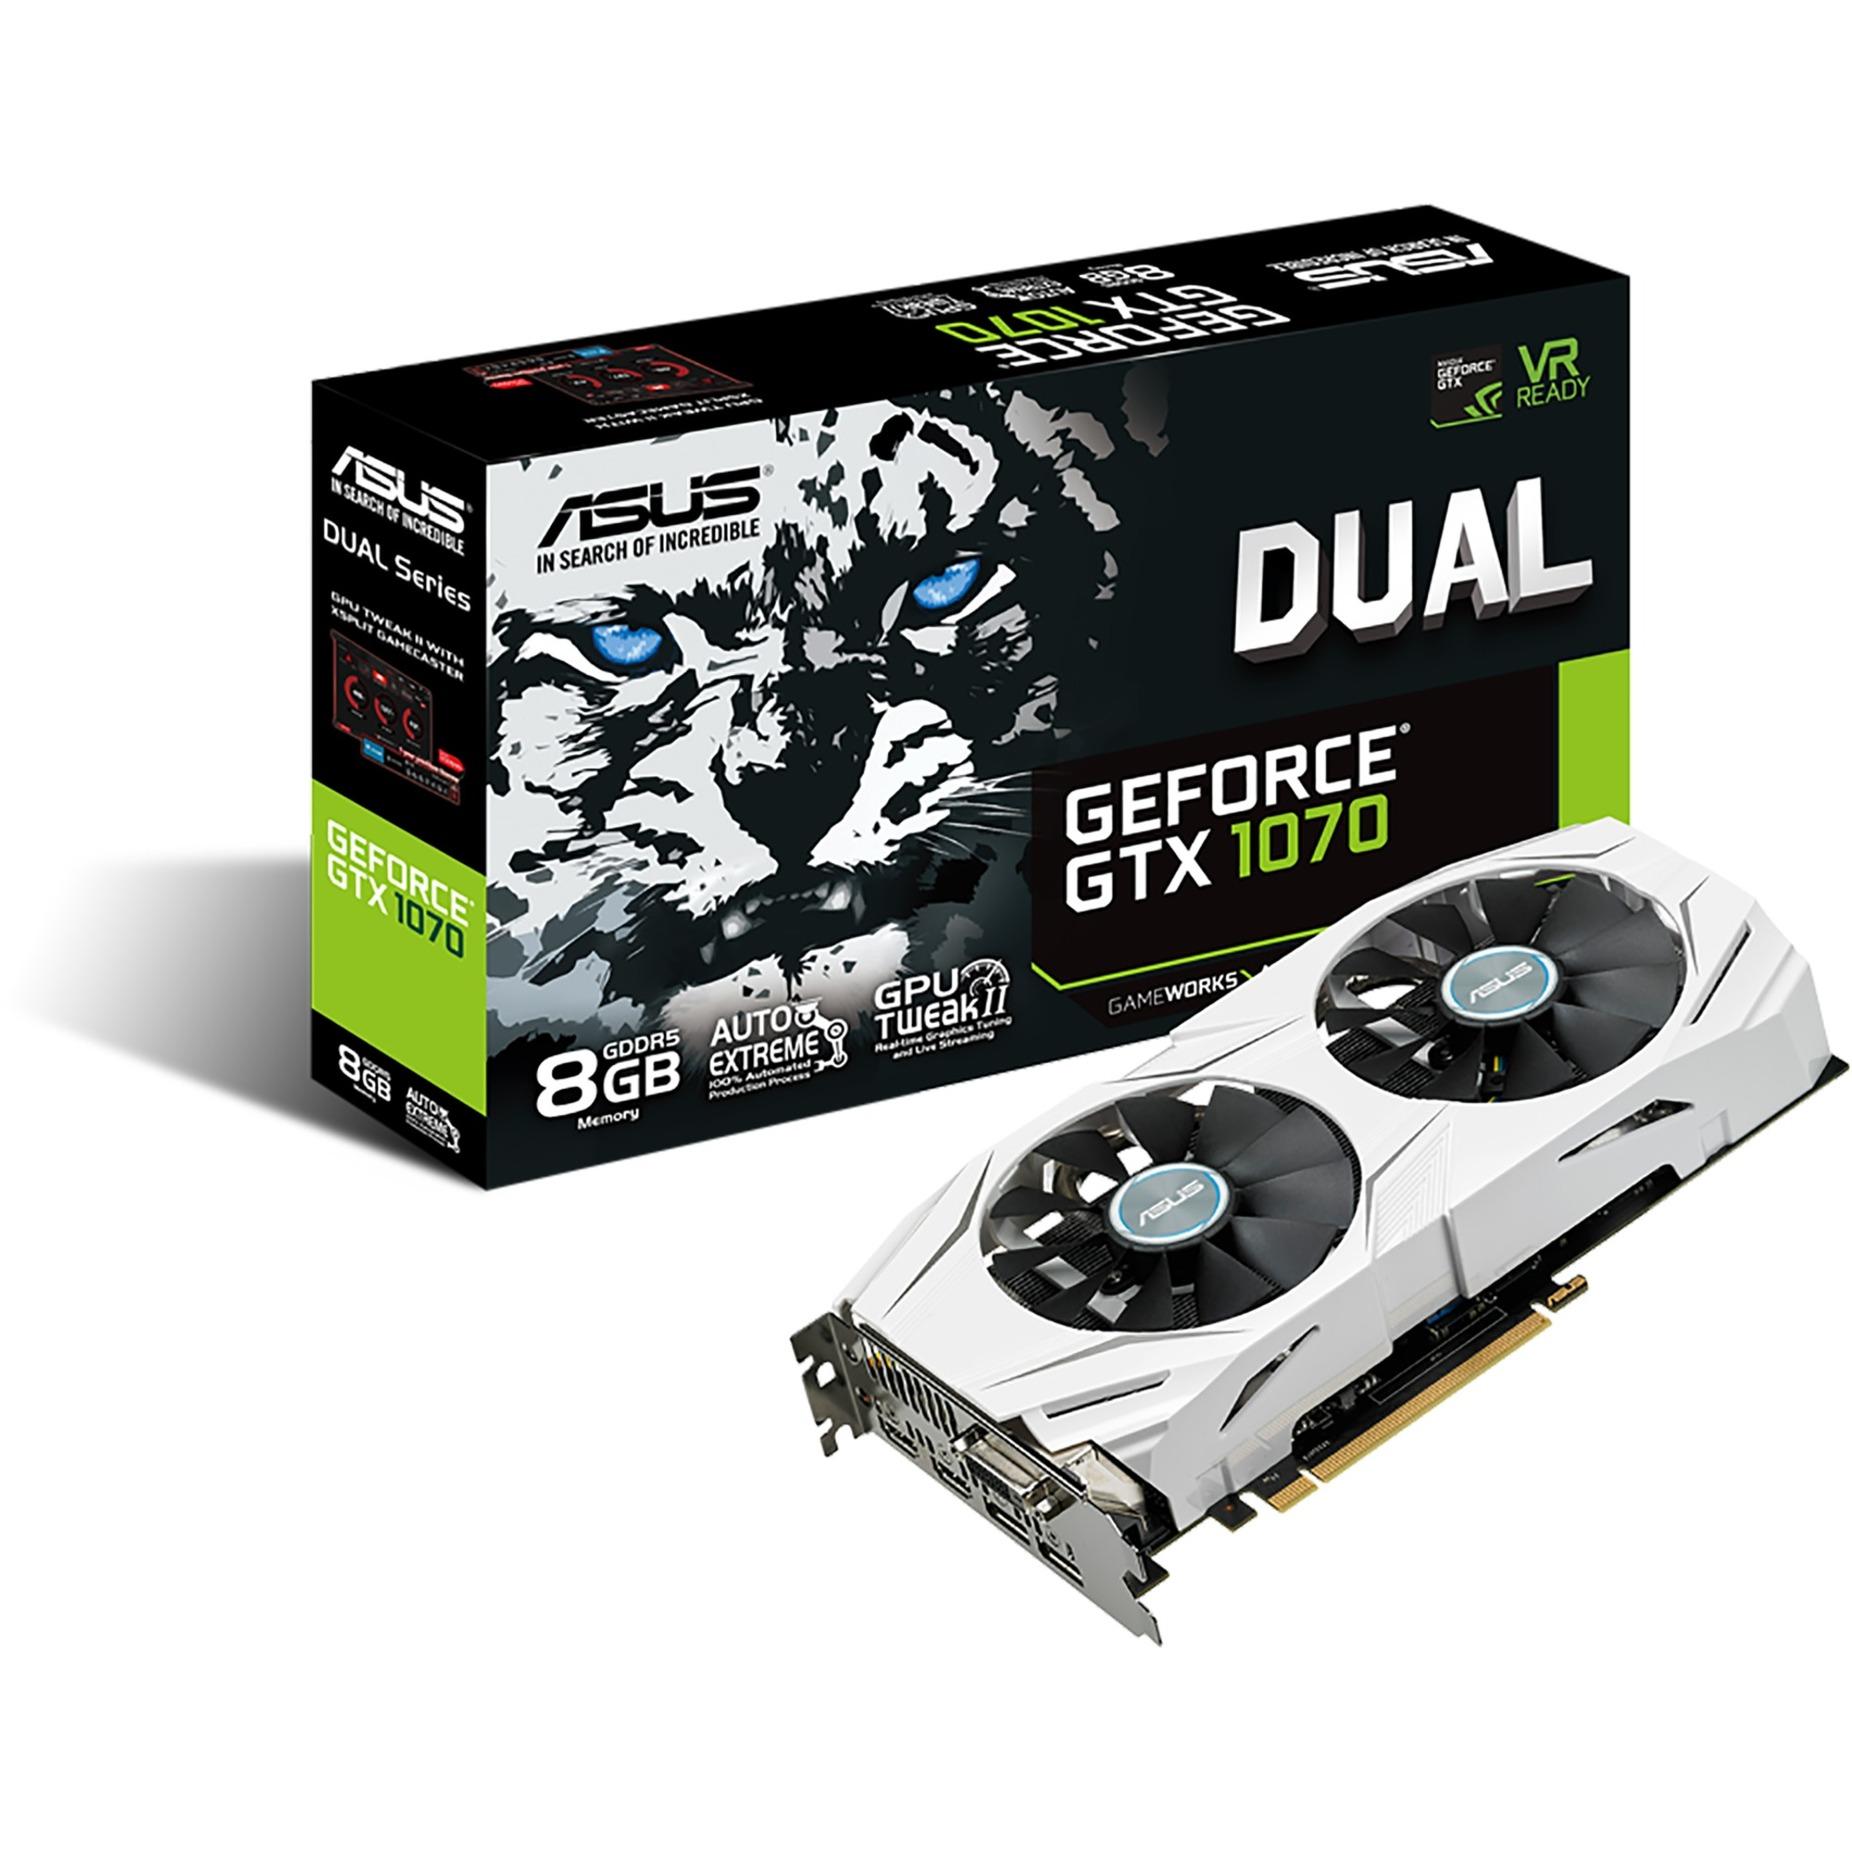 GeForce GTX 1070 DUAL, Carte graphique